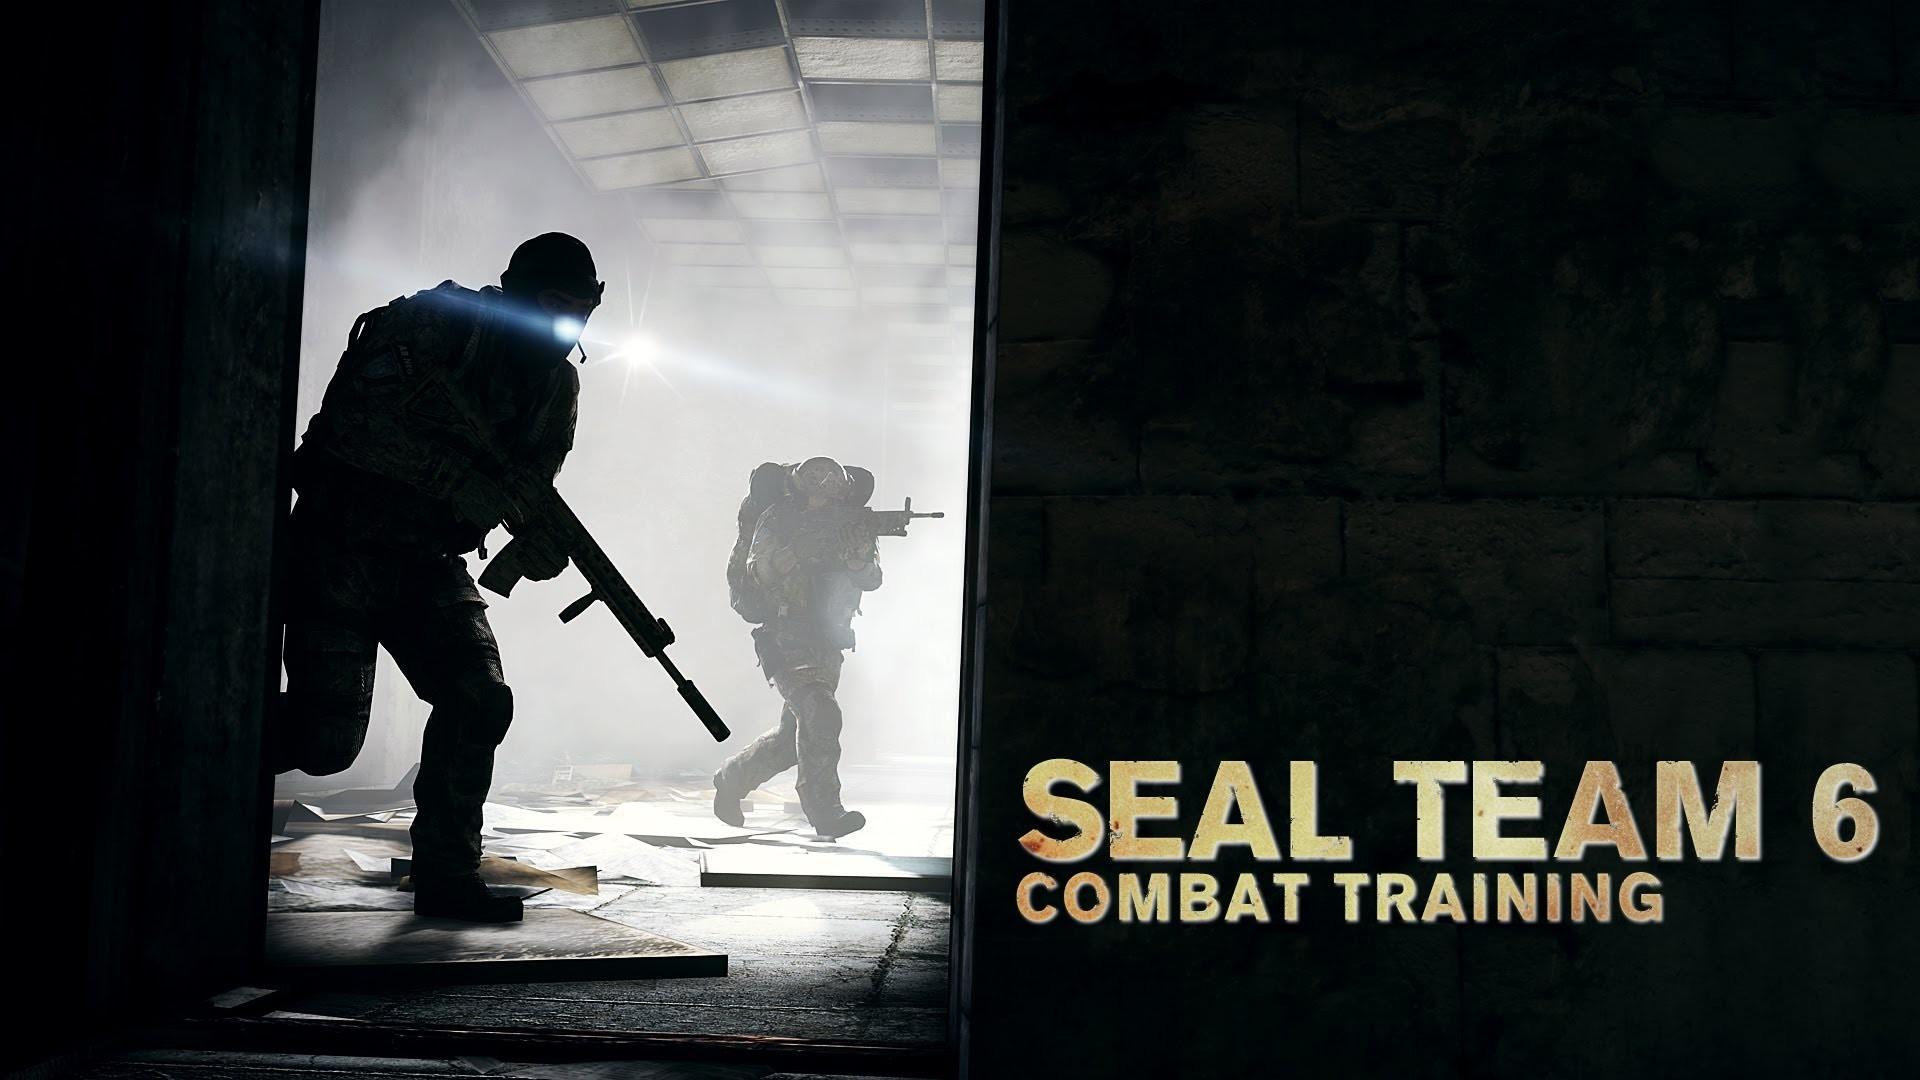 Fireteams: SEAL Team 6 Combat Training Series Episode 3 .